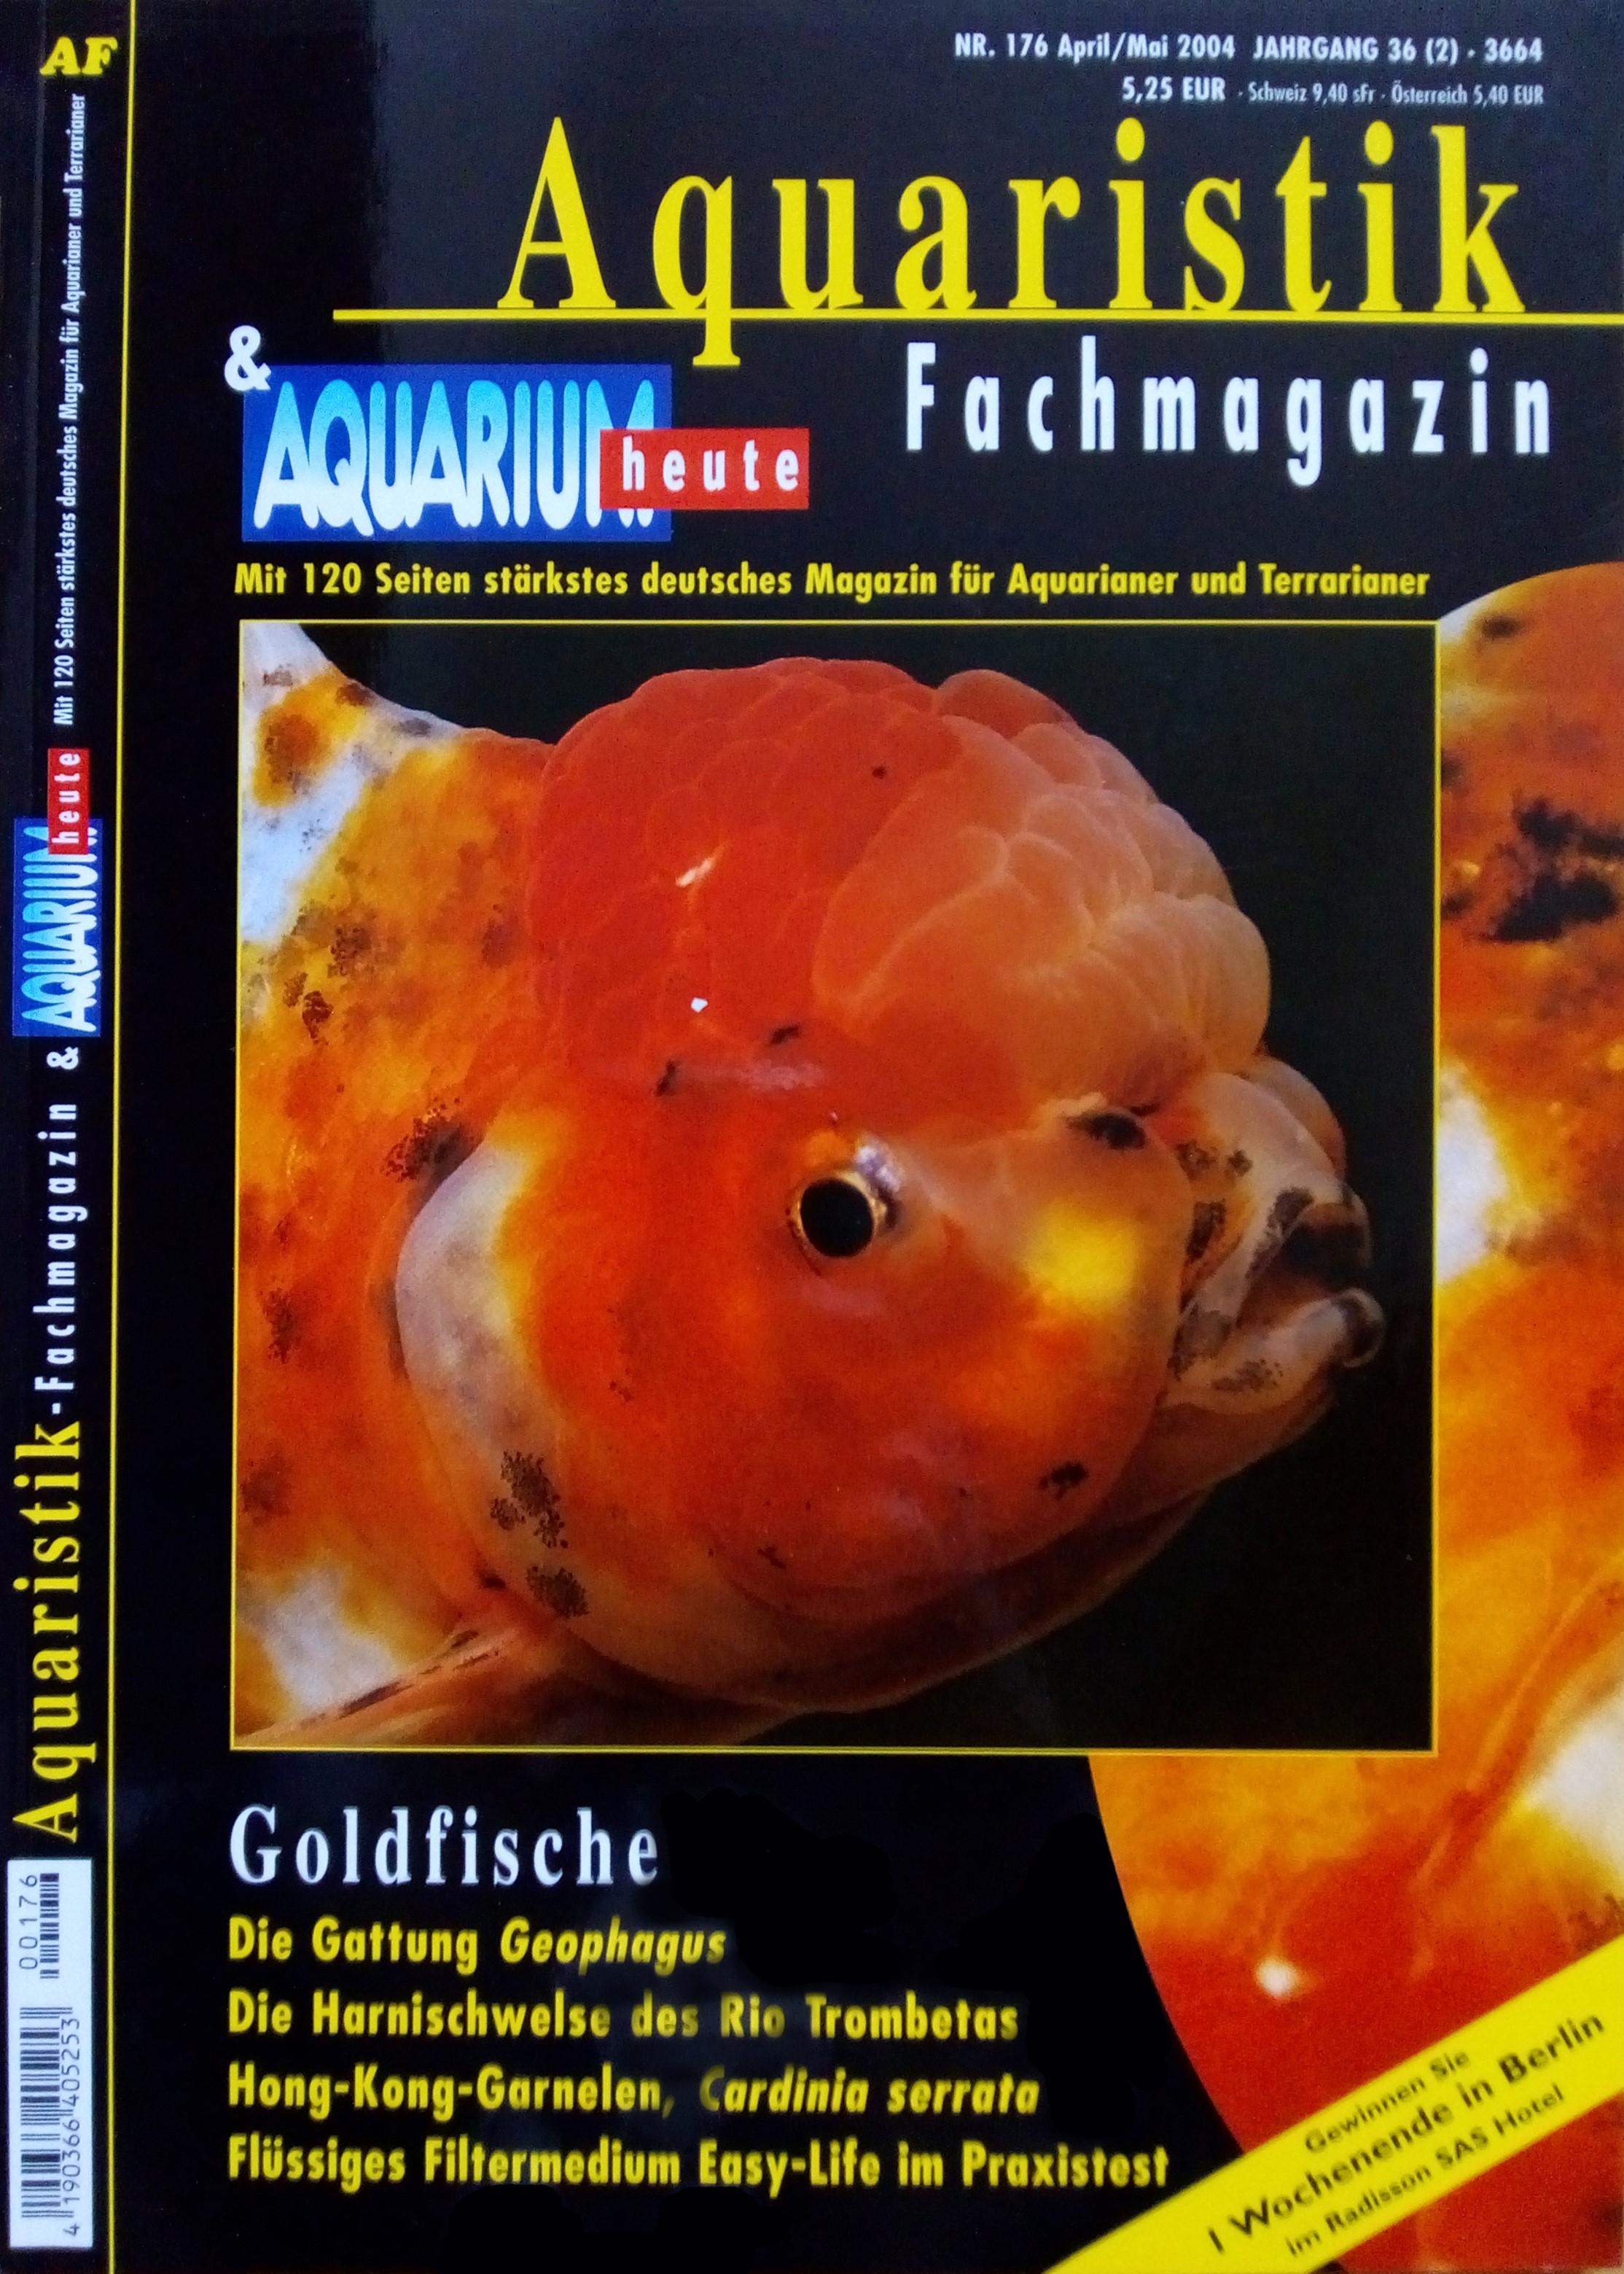 Aquaristik-Fachmagazin, Ausgabe 176